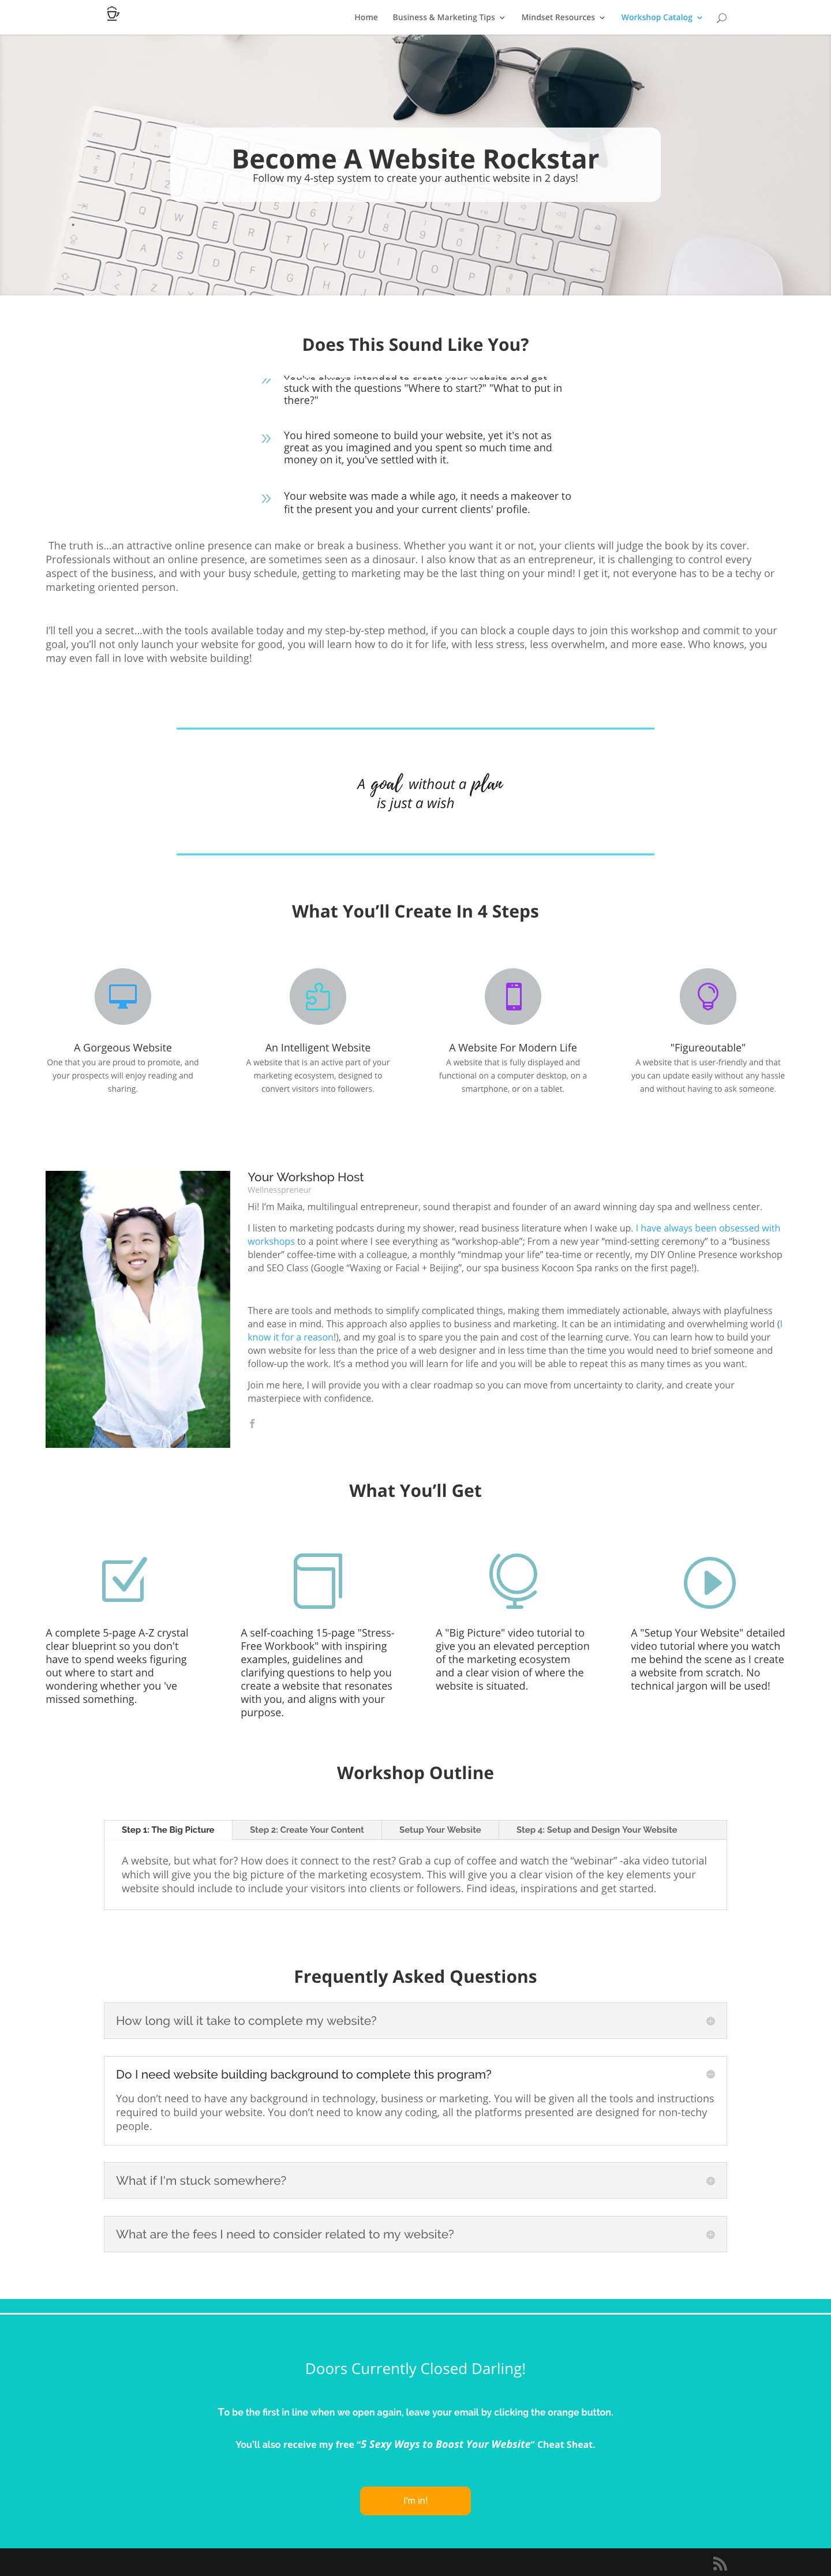 using the Divi builder for Wordpress